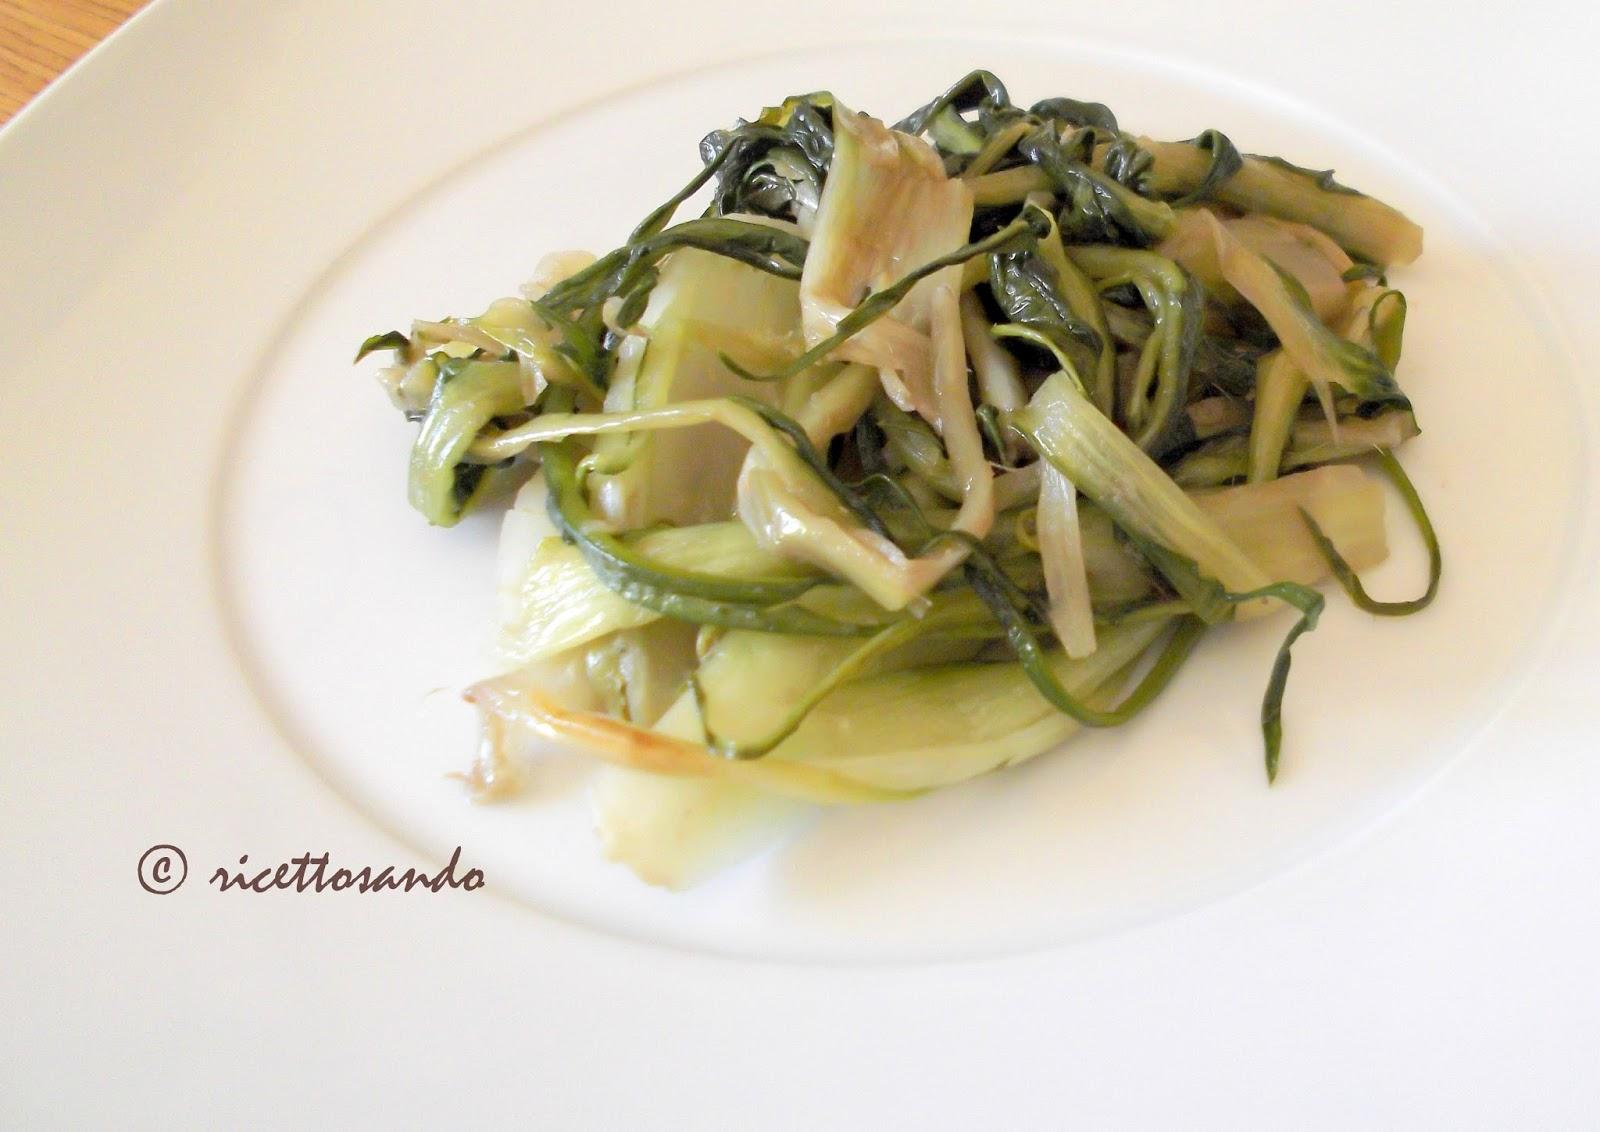 Puntarelle saporite ricette contorno di verdure